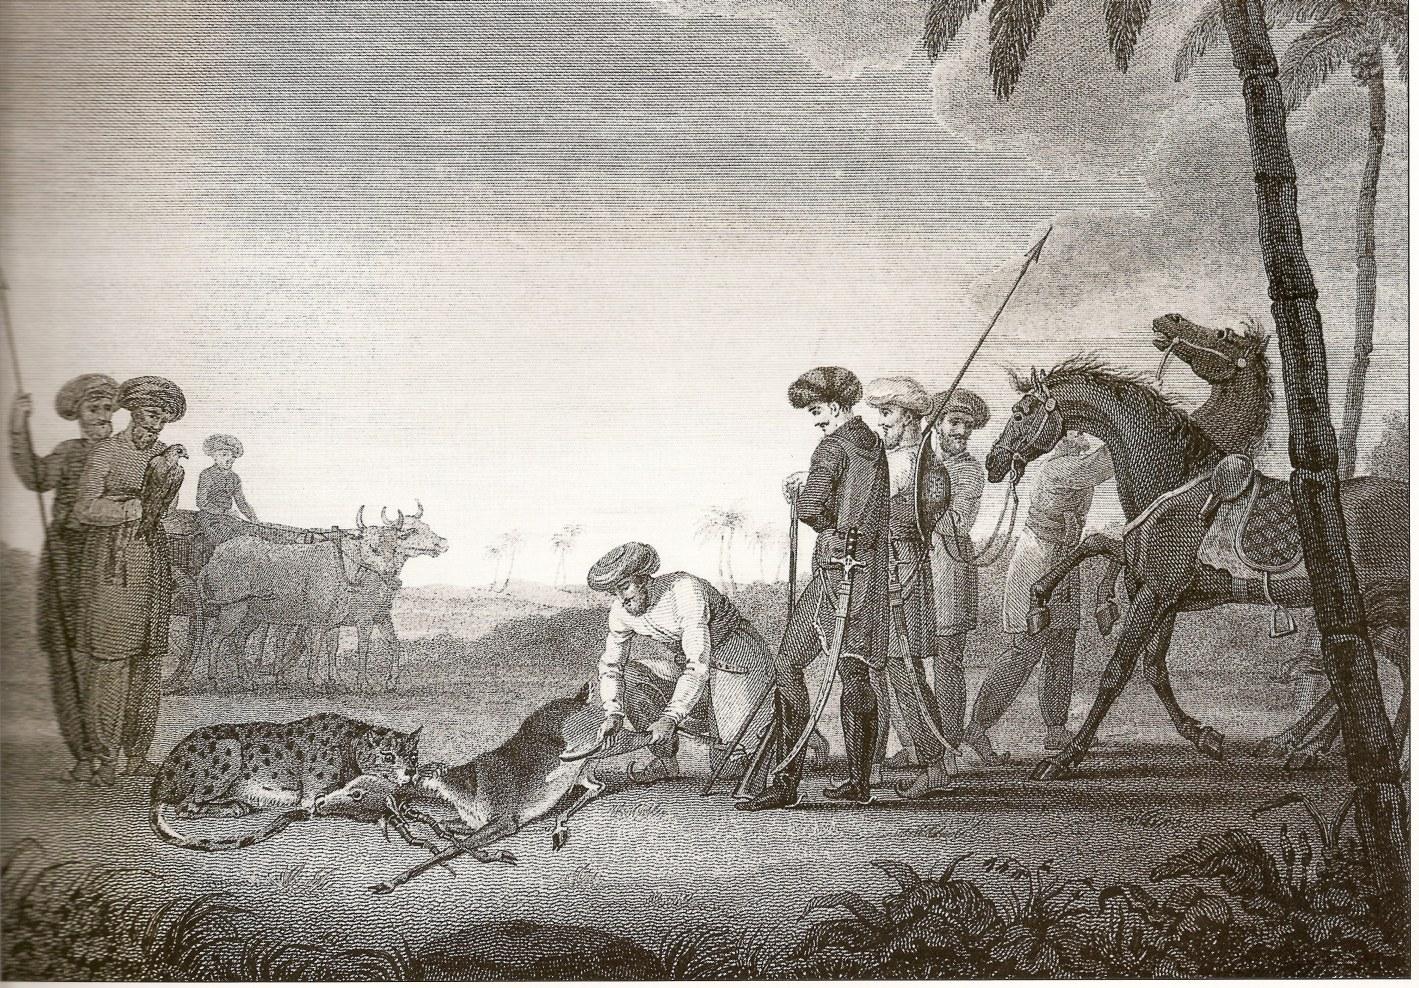 Drawn hunting cheetah Jpg File:CheetahHunt File:CheetahHunt Wikimedia jpg